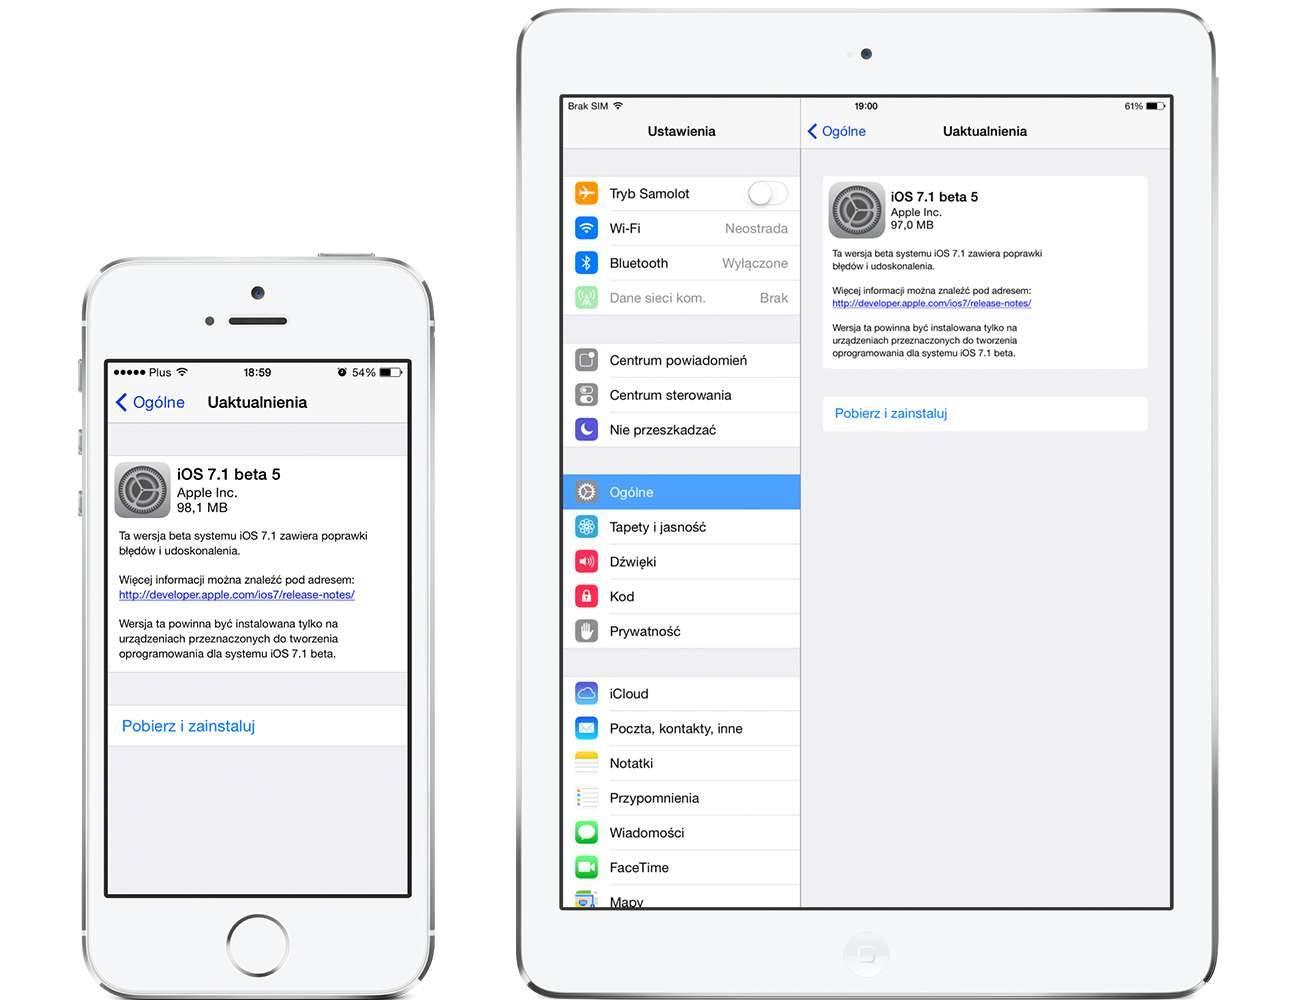 iOS7.1b5